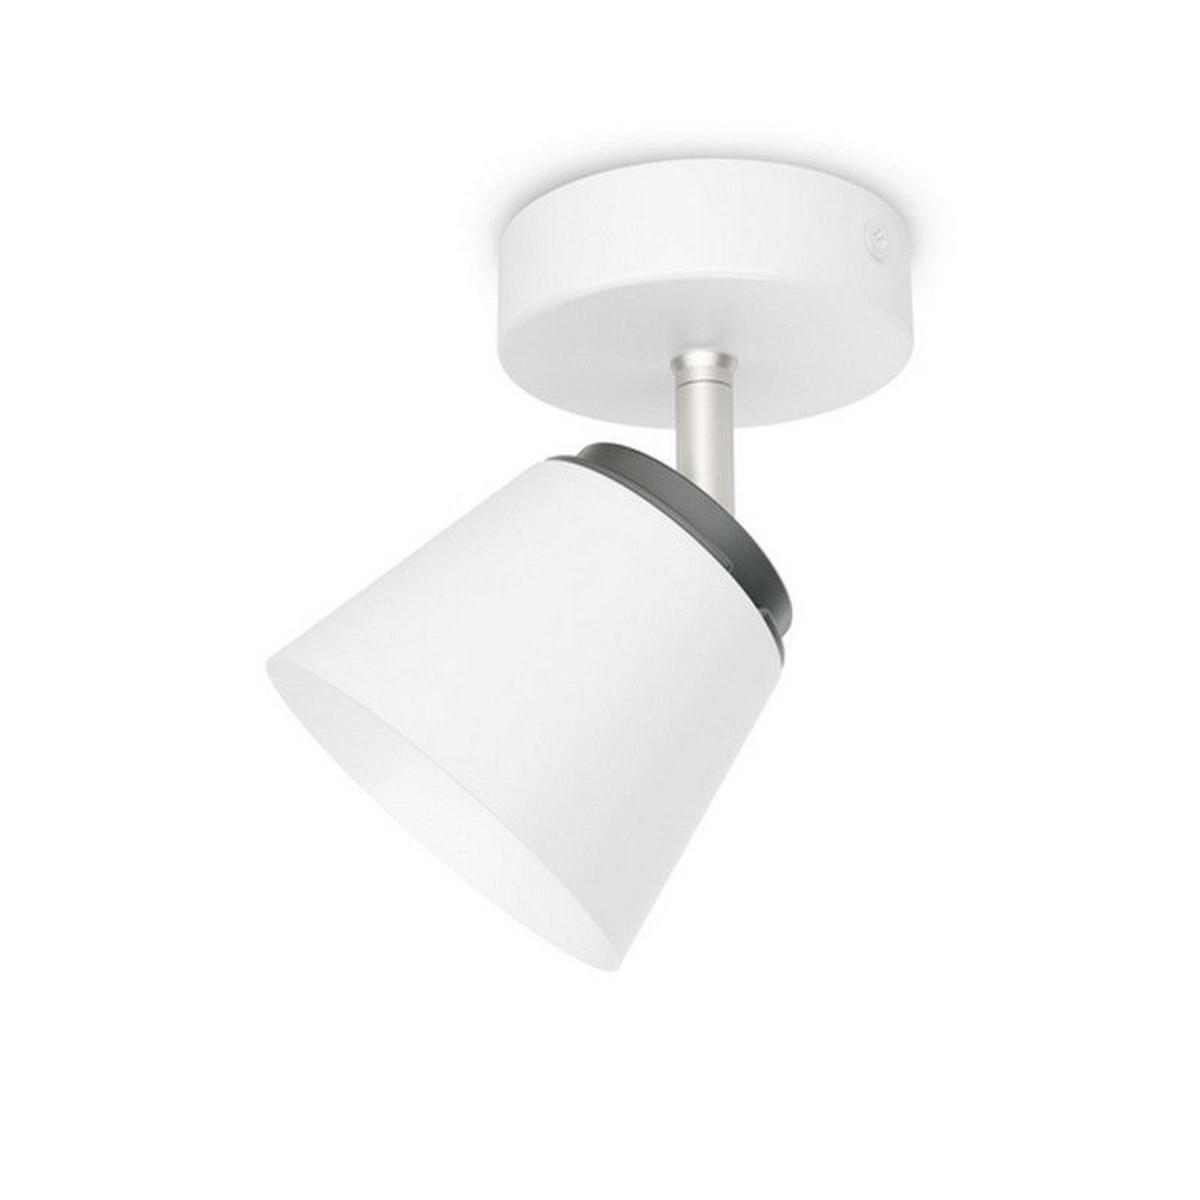 Spot décoration Dender LED H13 cm